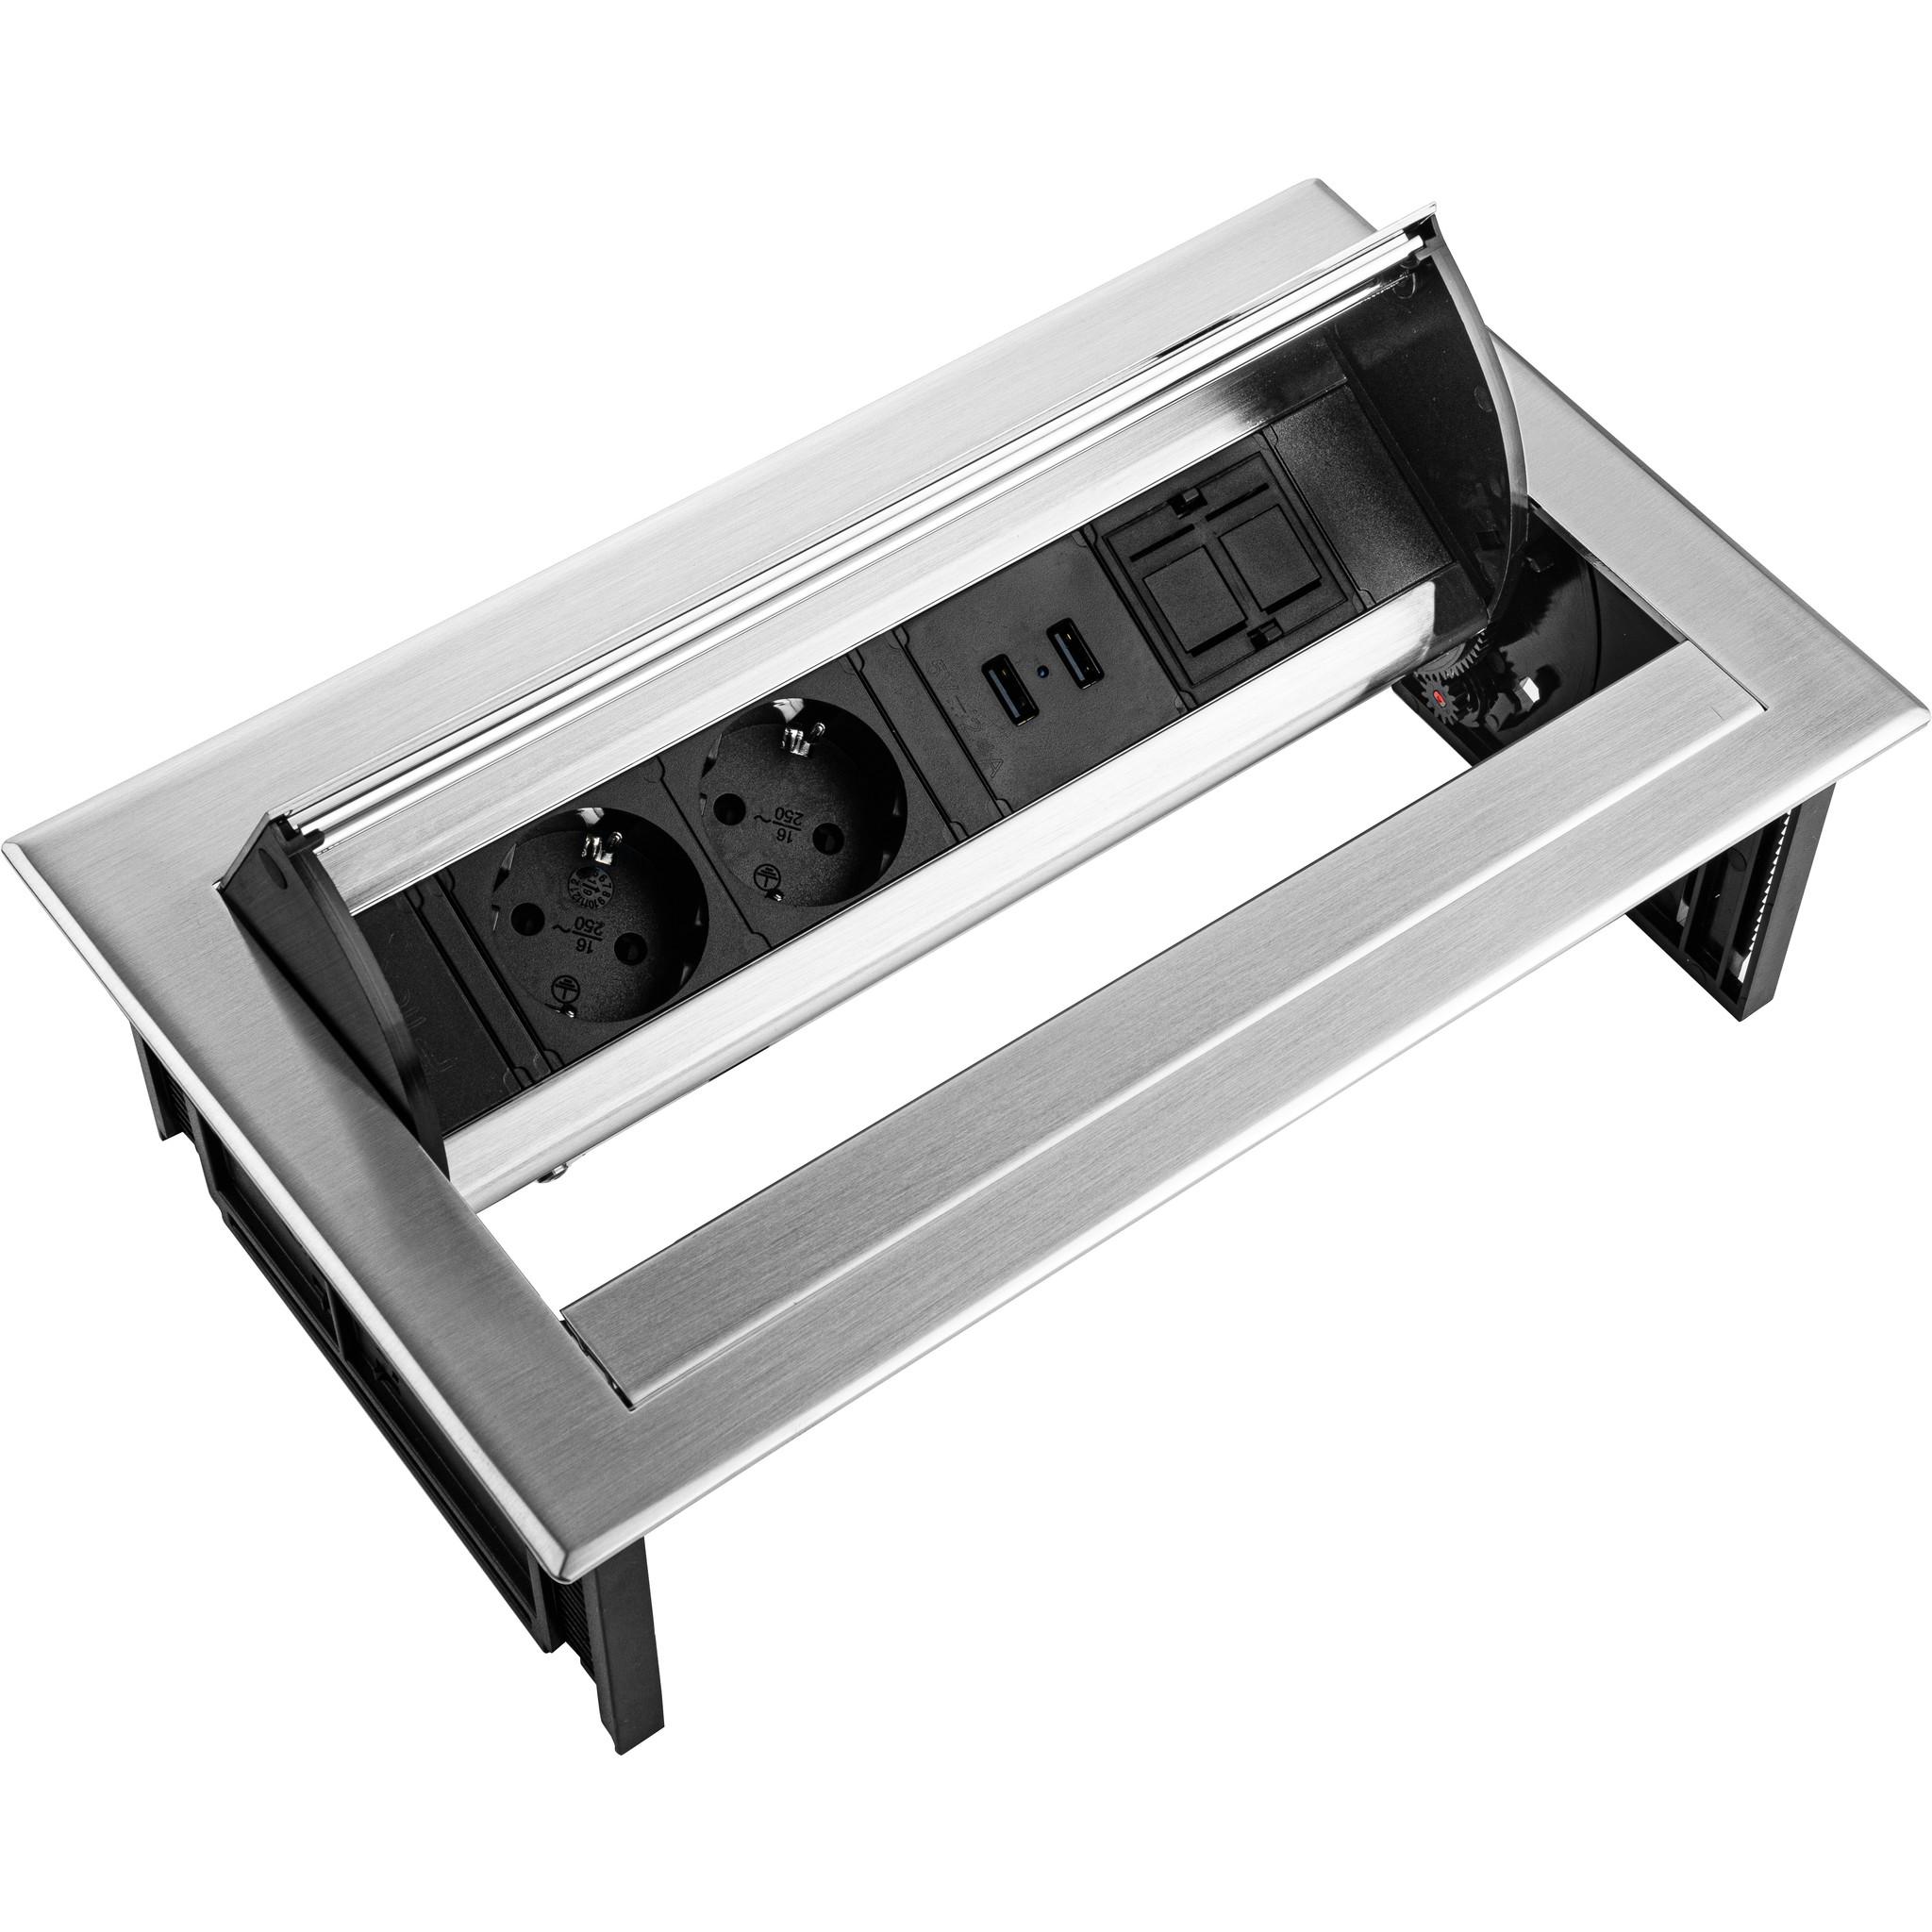 Ergopro Desk In - 2x power, 2x USB charger & 2x keystone zilvergrijs